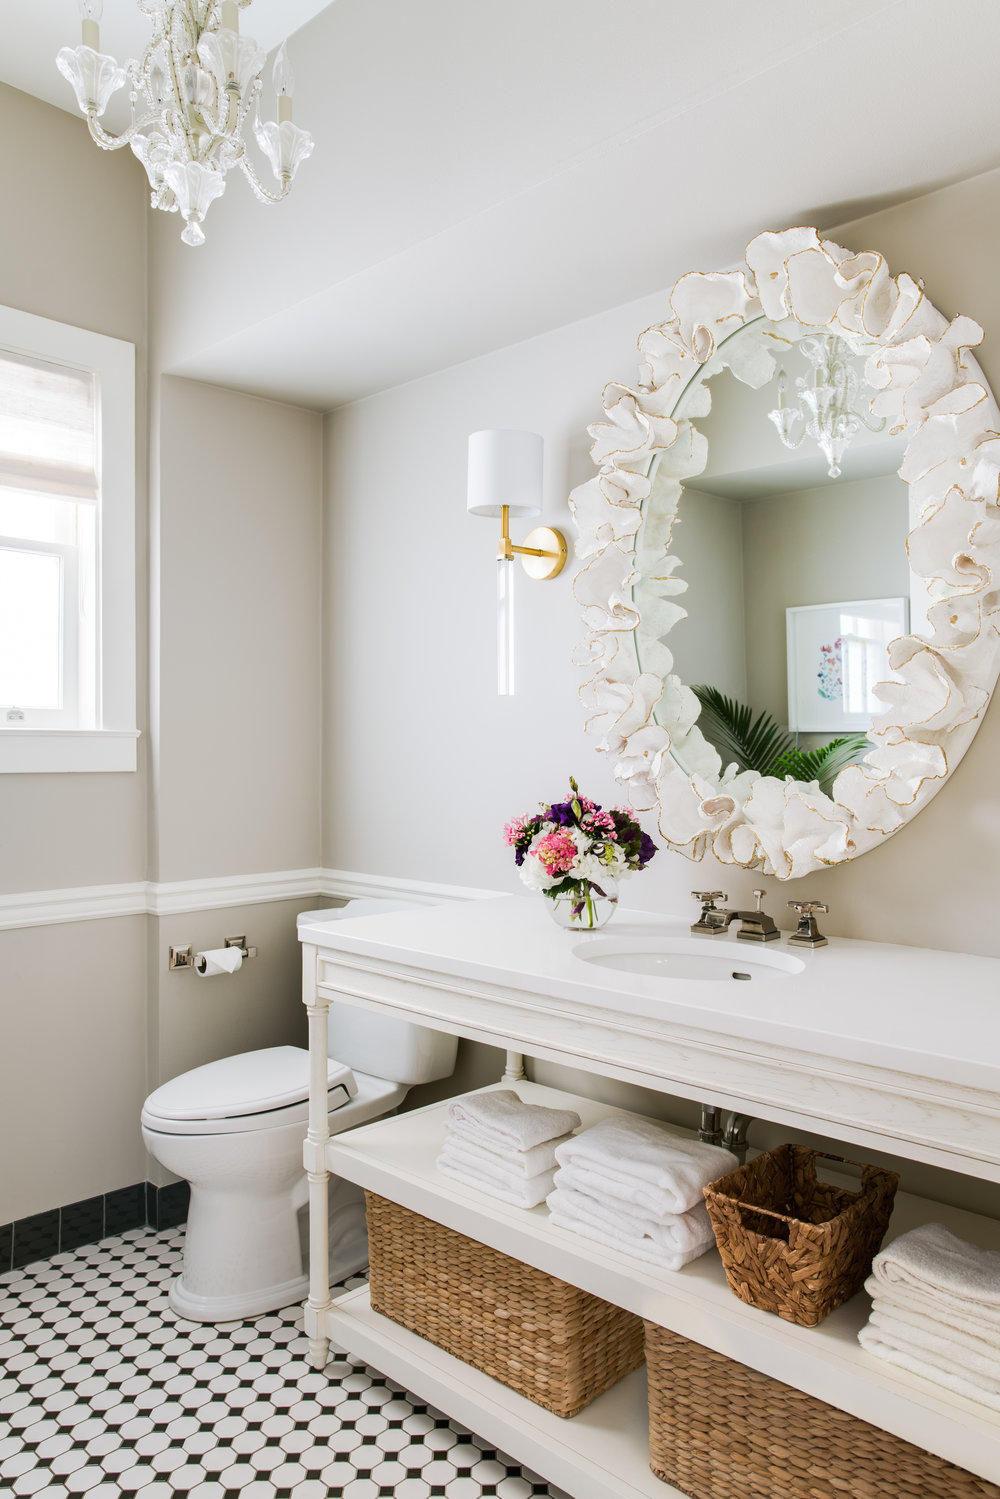 JLinterteriordesign_Maloyan Bathroom 1259 Dk4 HDR